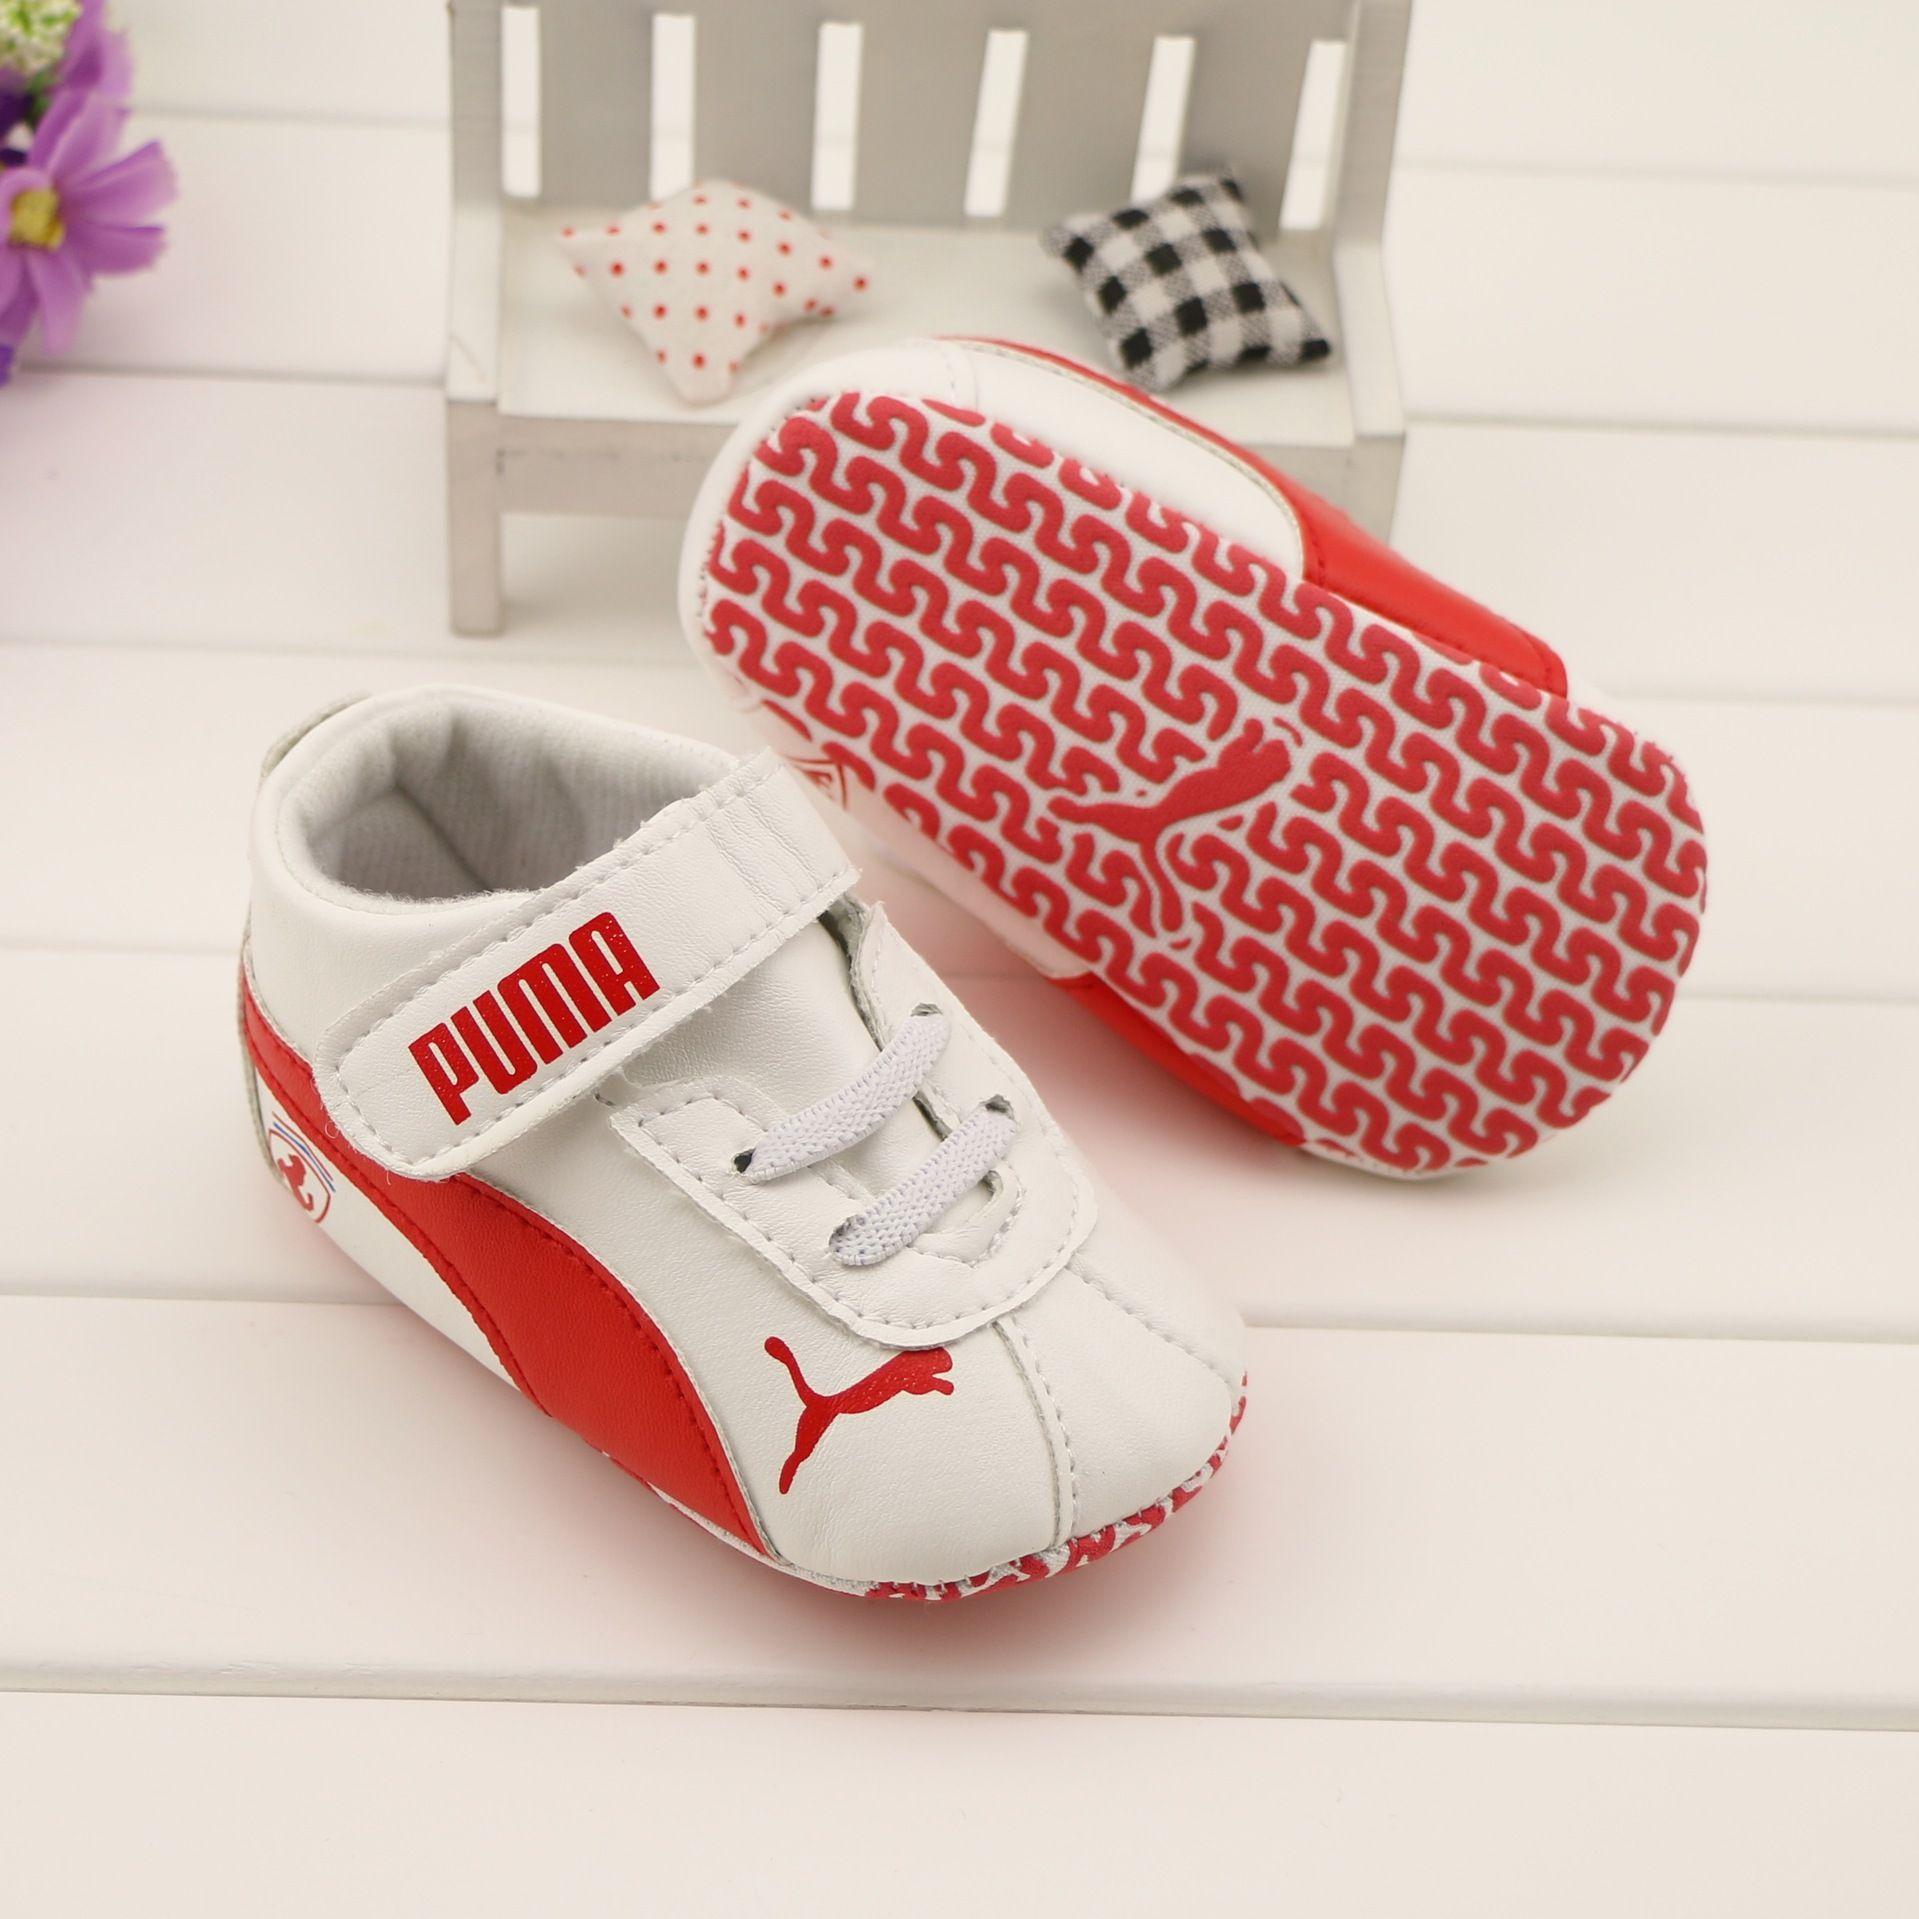 puma Baby Shoes Soft Bottom Boy Prewalker